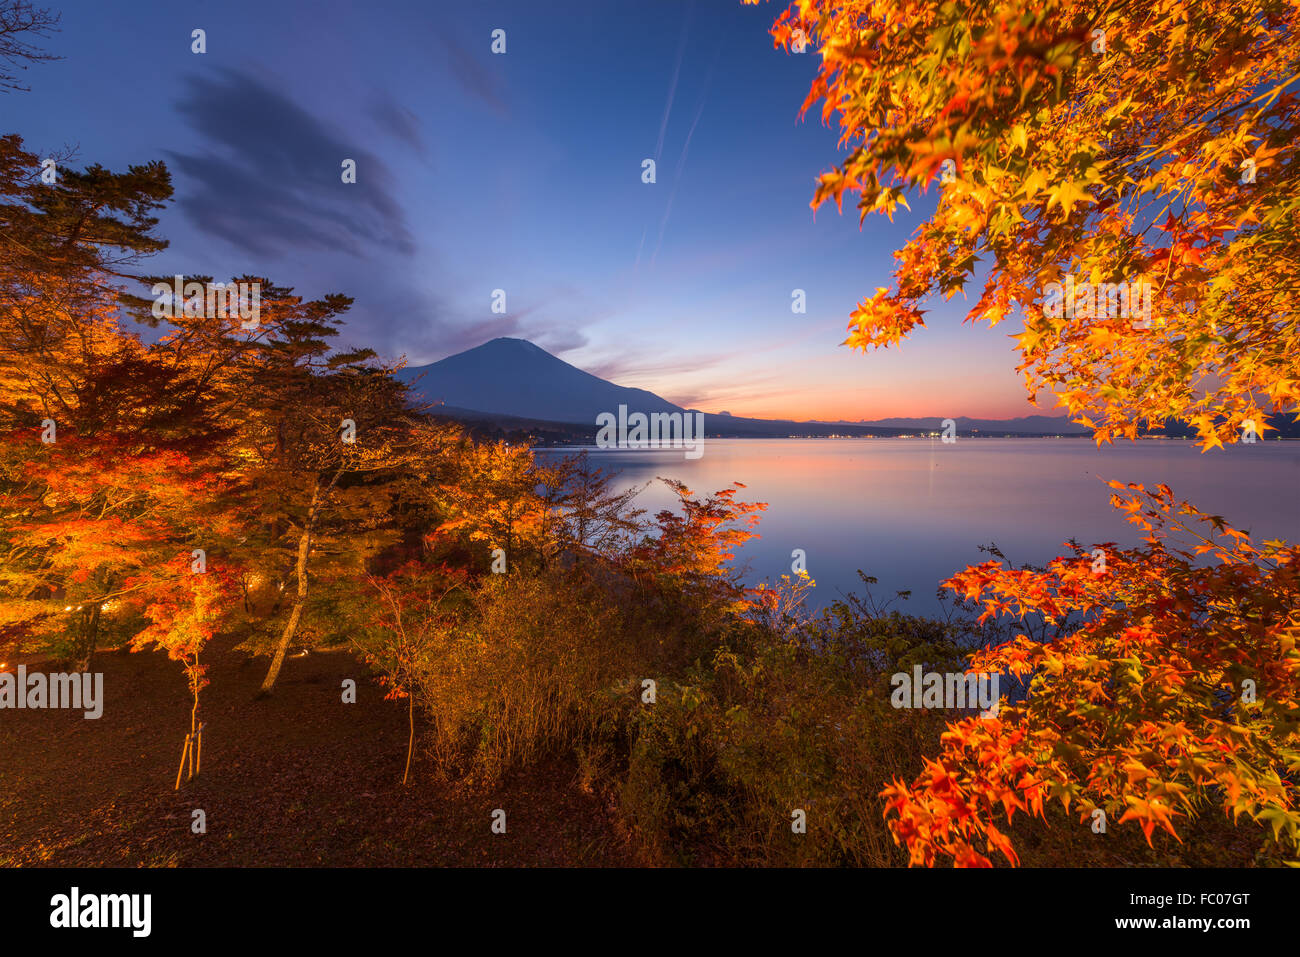 Mt. Fuji, Japan during autumn from the shore of Lake Yamanaka. - Stock Image